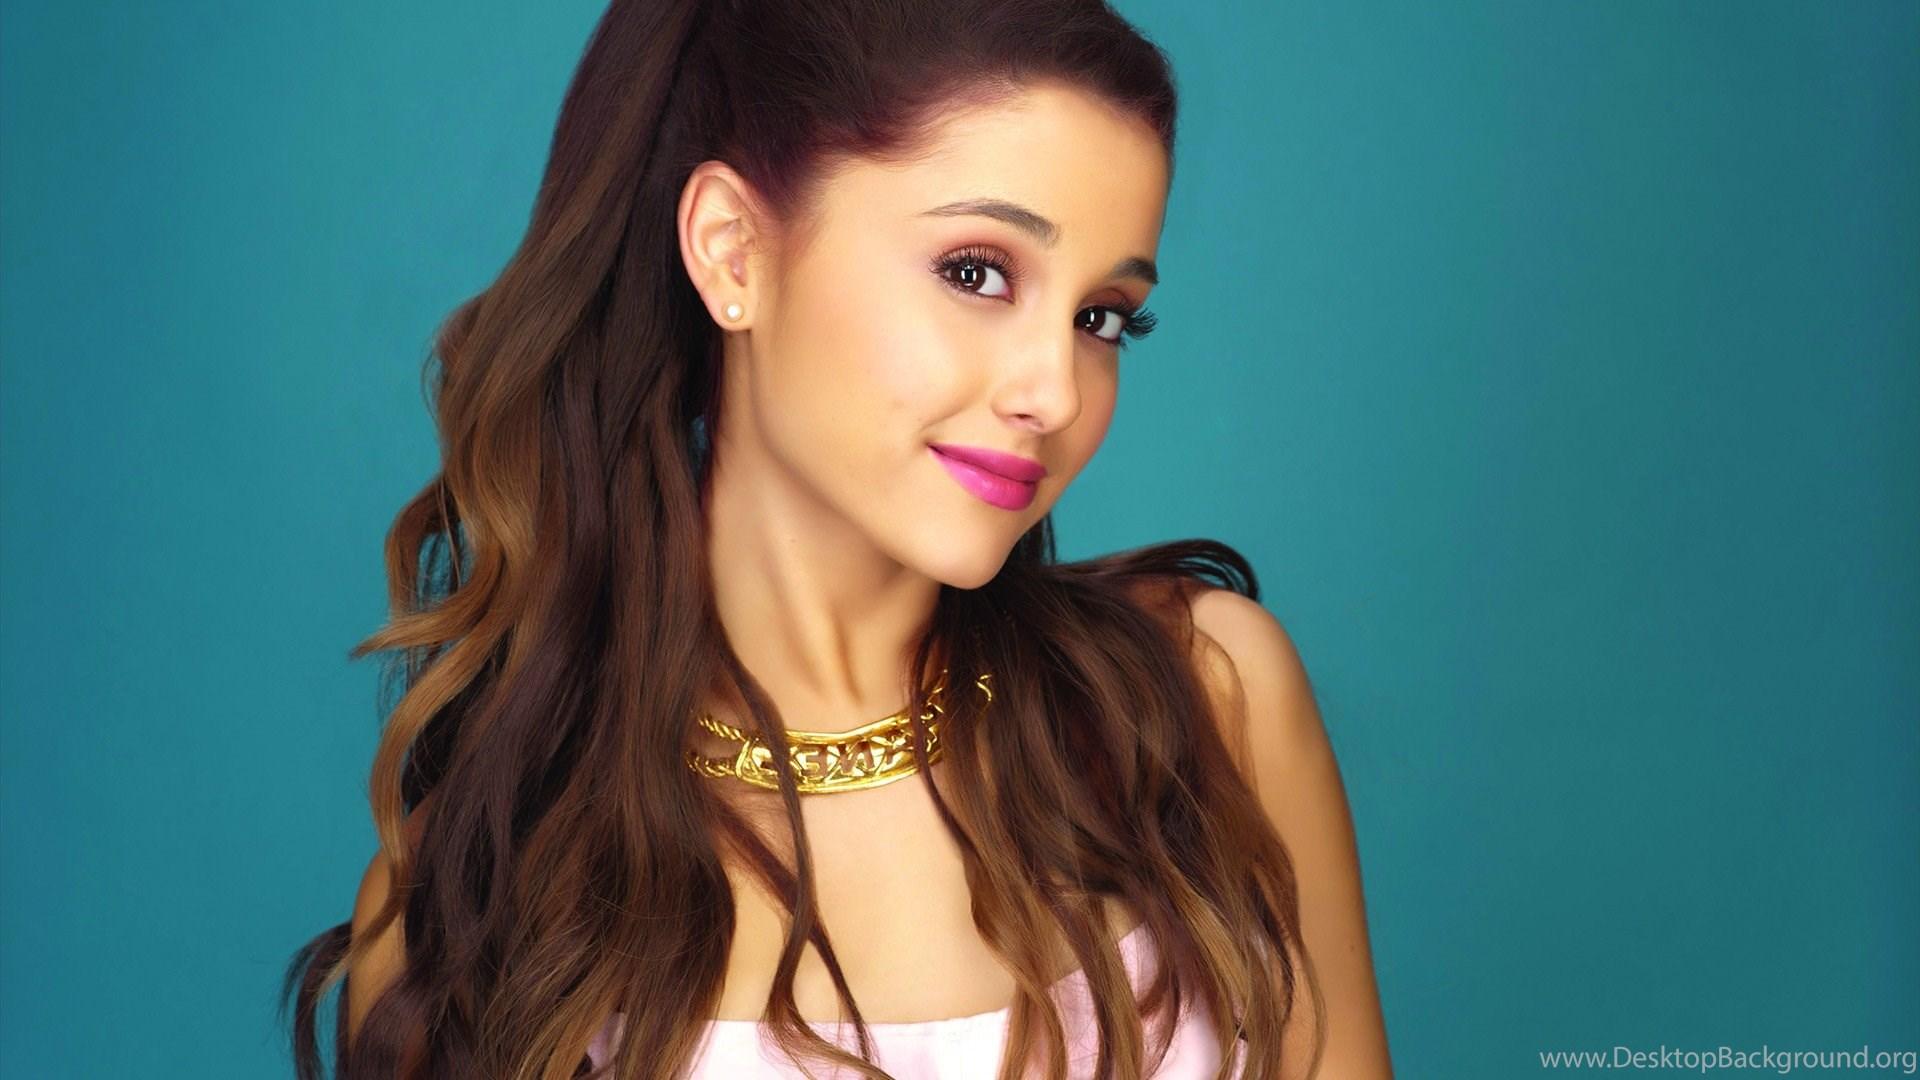 Ariana Grande Wallpapers Collection 42 Desktop Background